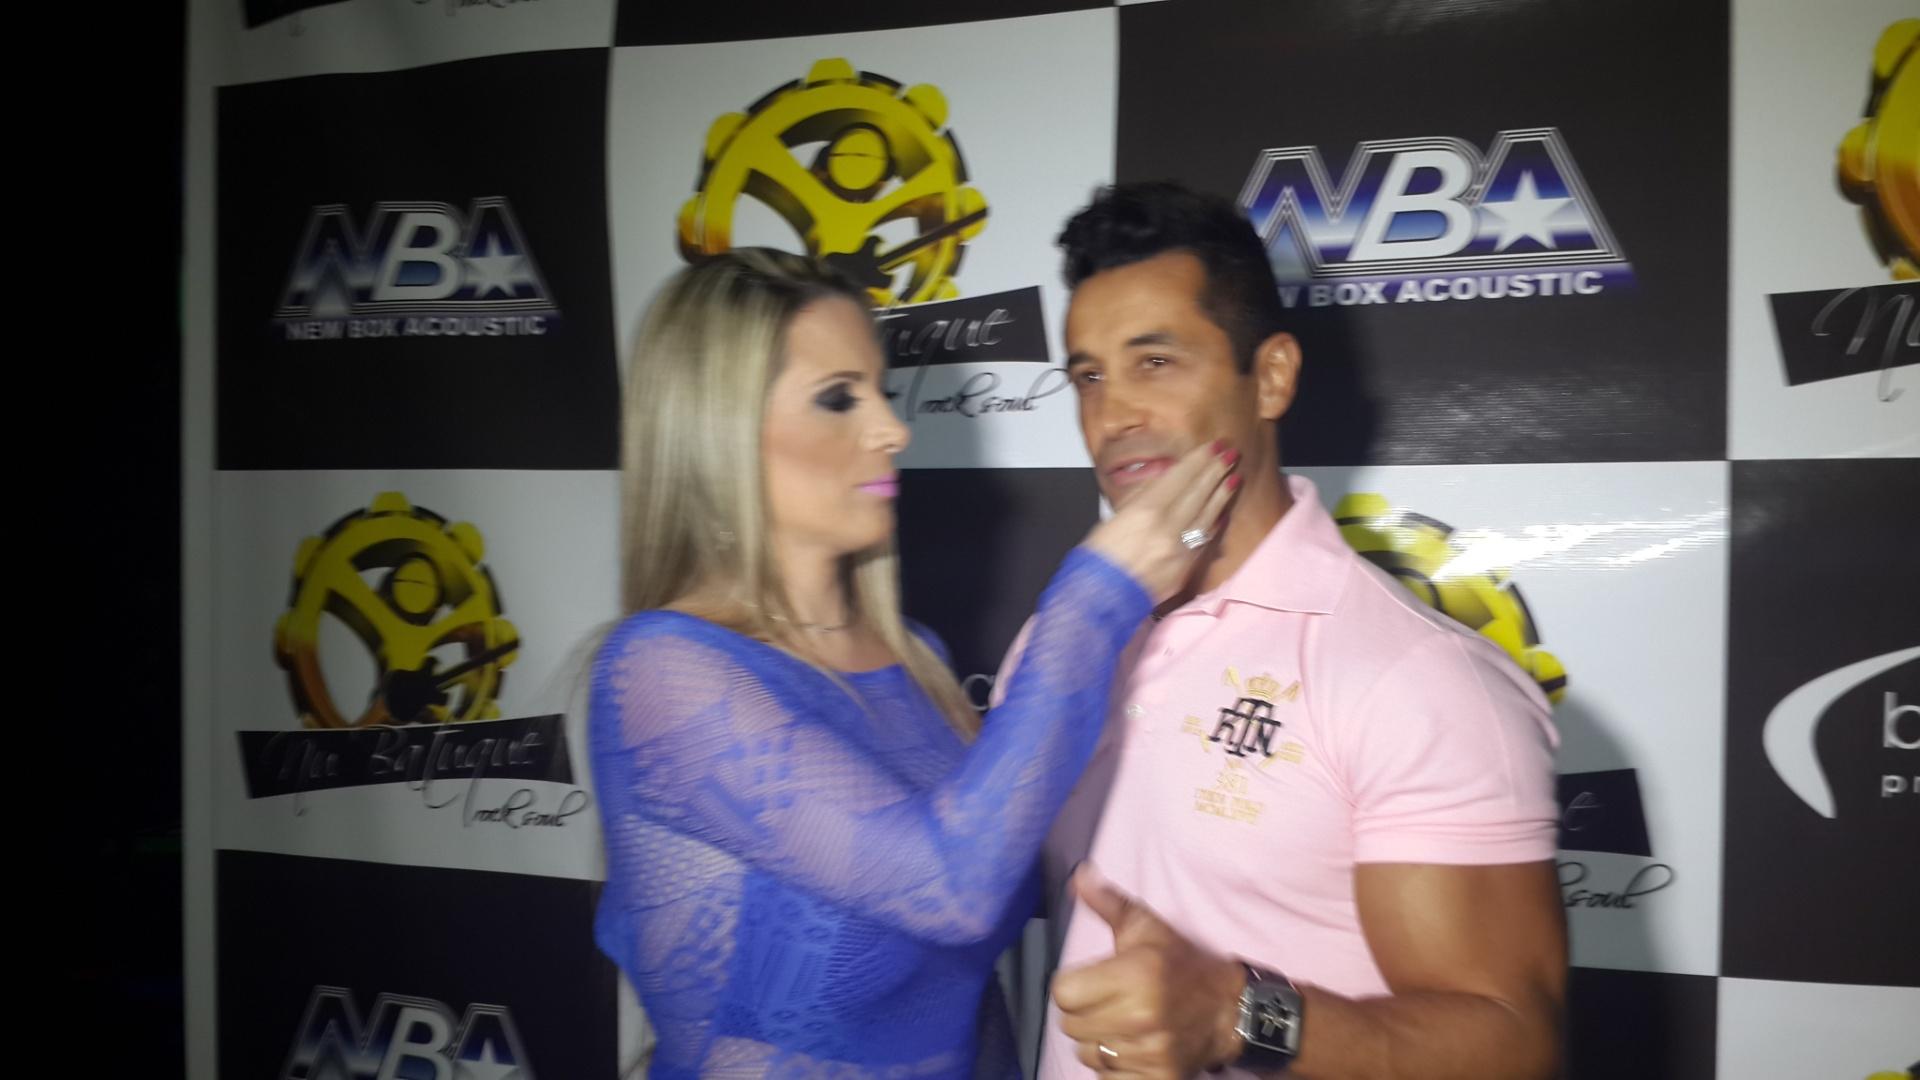 3.out.2013 - Marcos Oliver e a mulher Fabíola Monarca